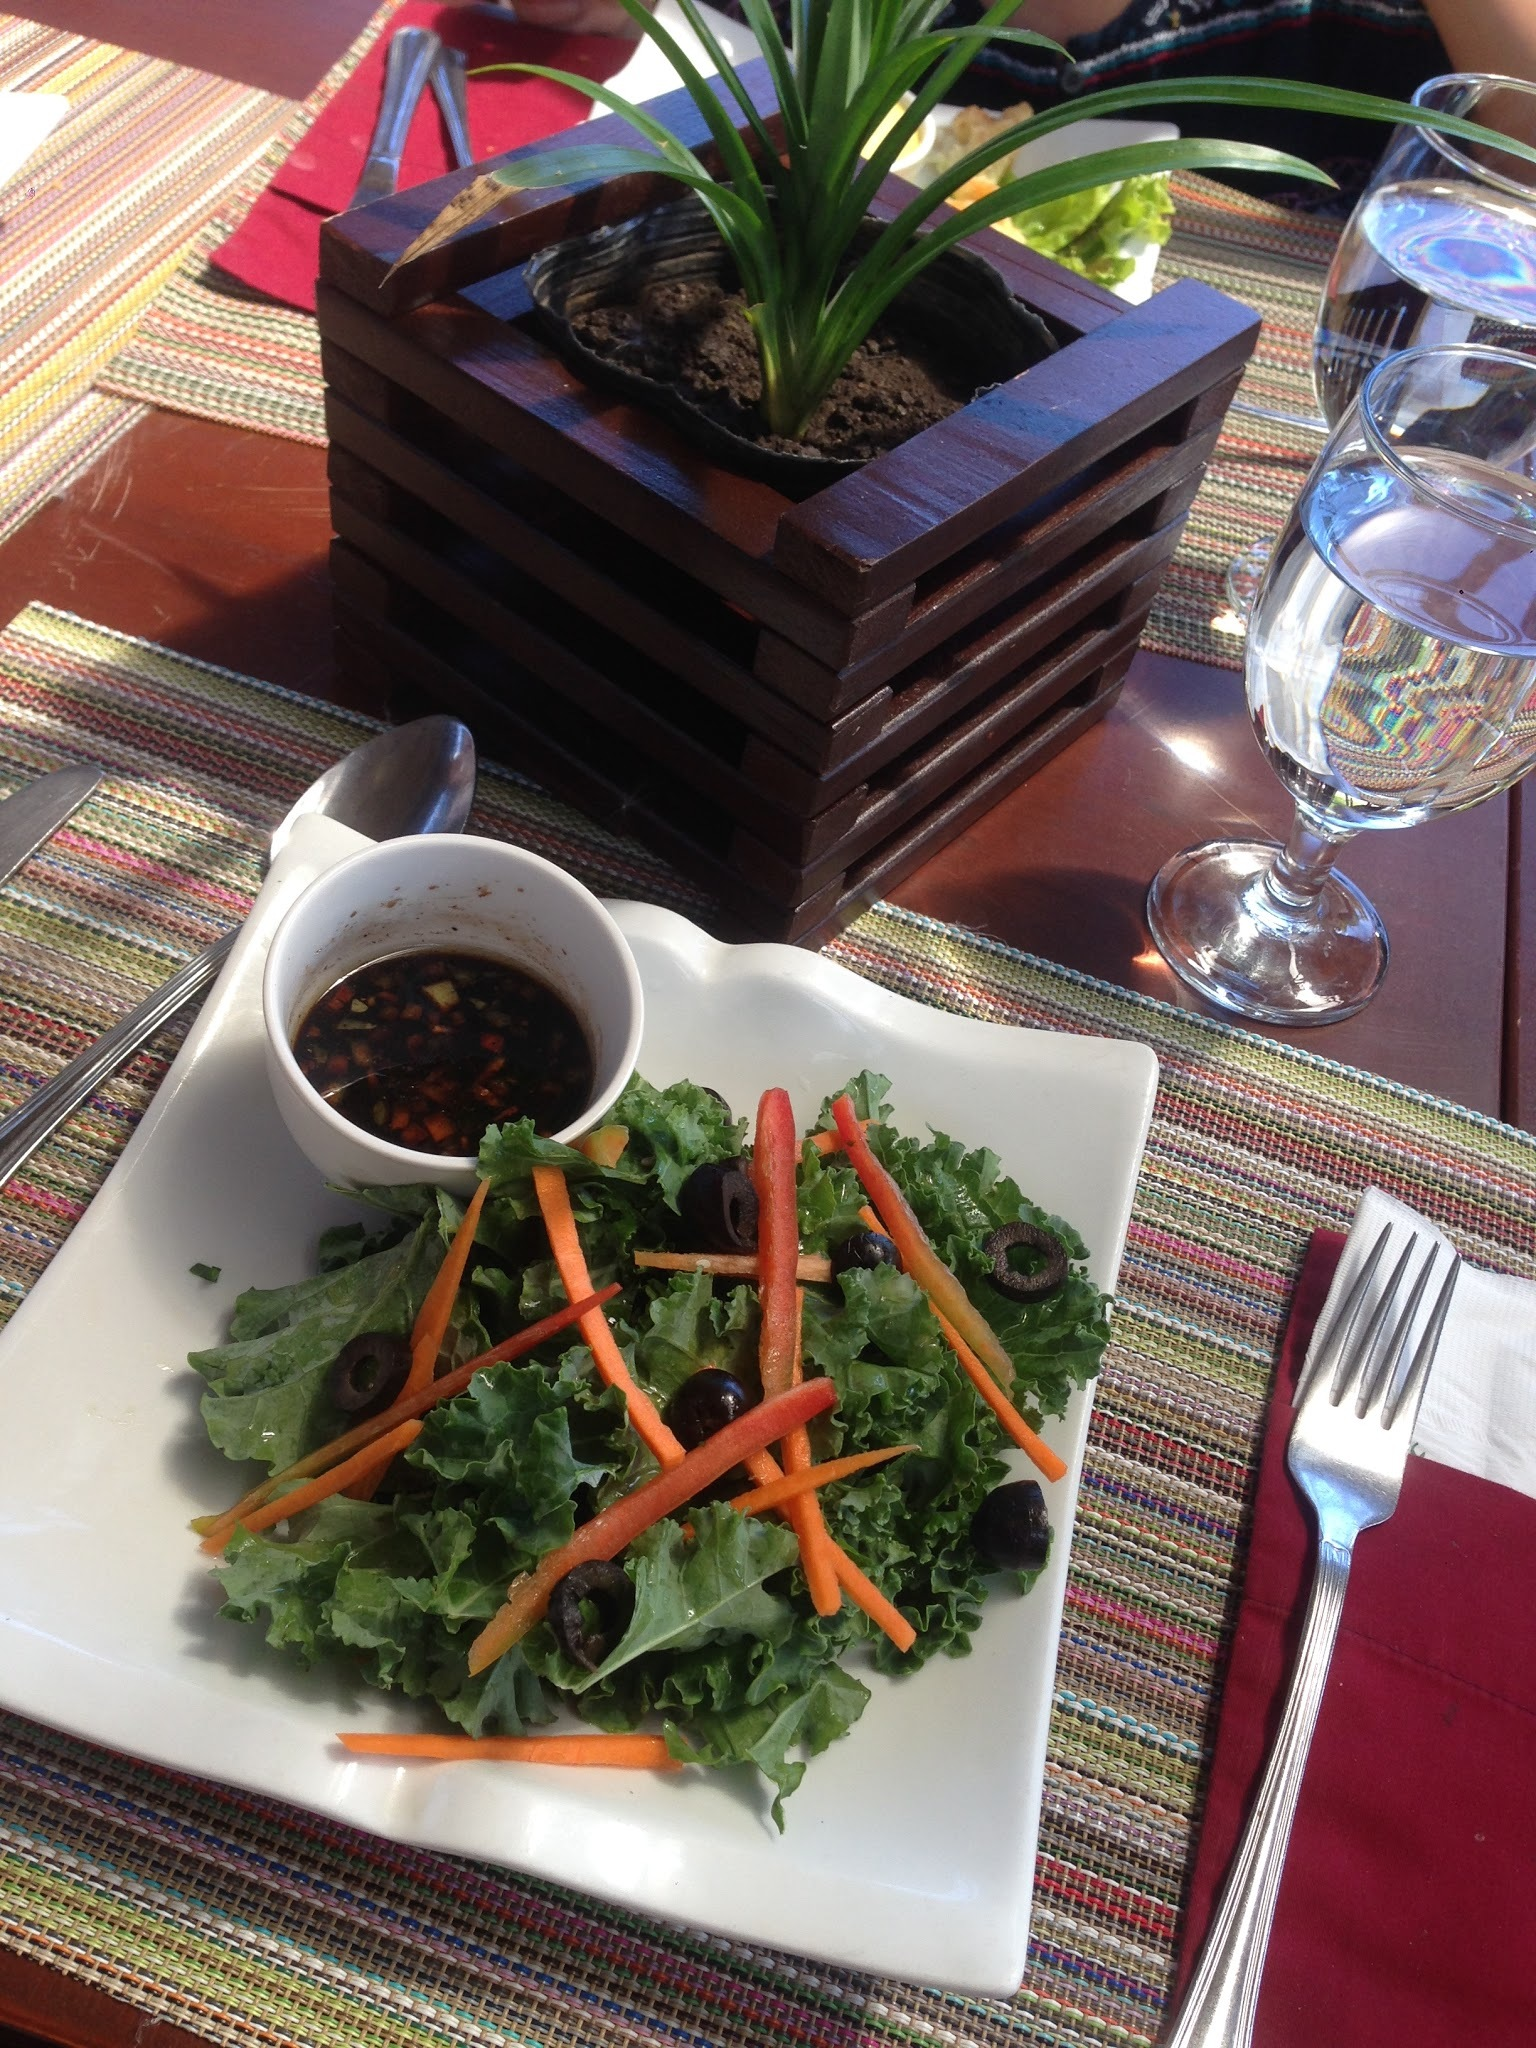 My kale salad